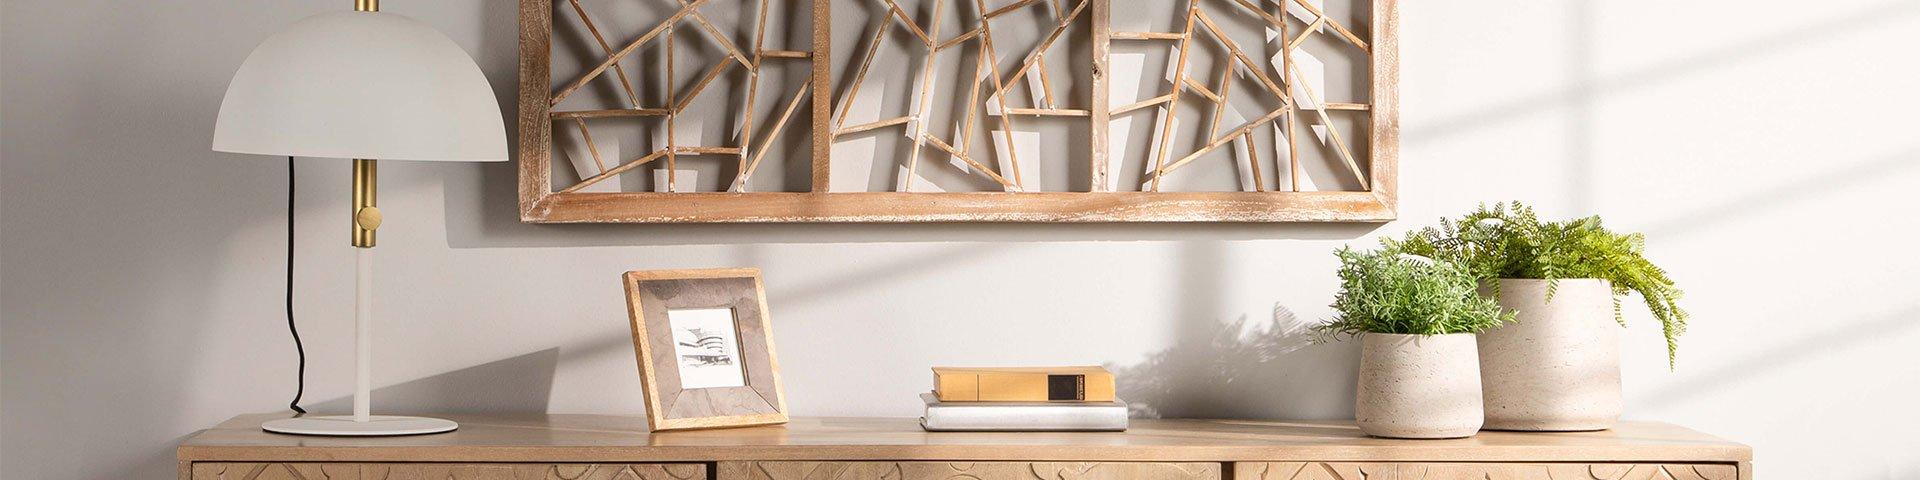 Accessories at Abode Furniture